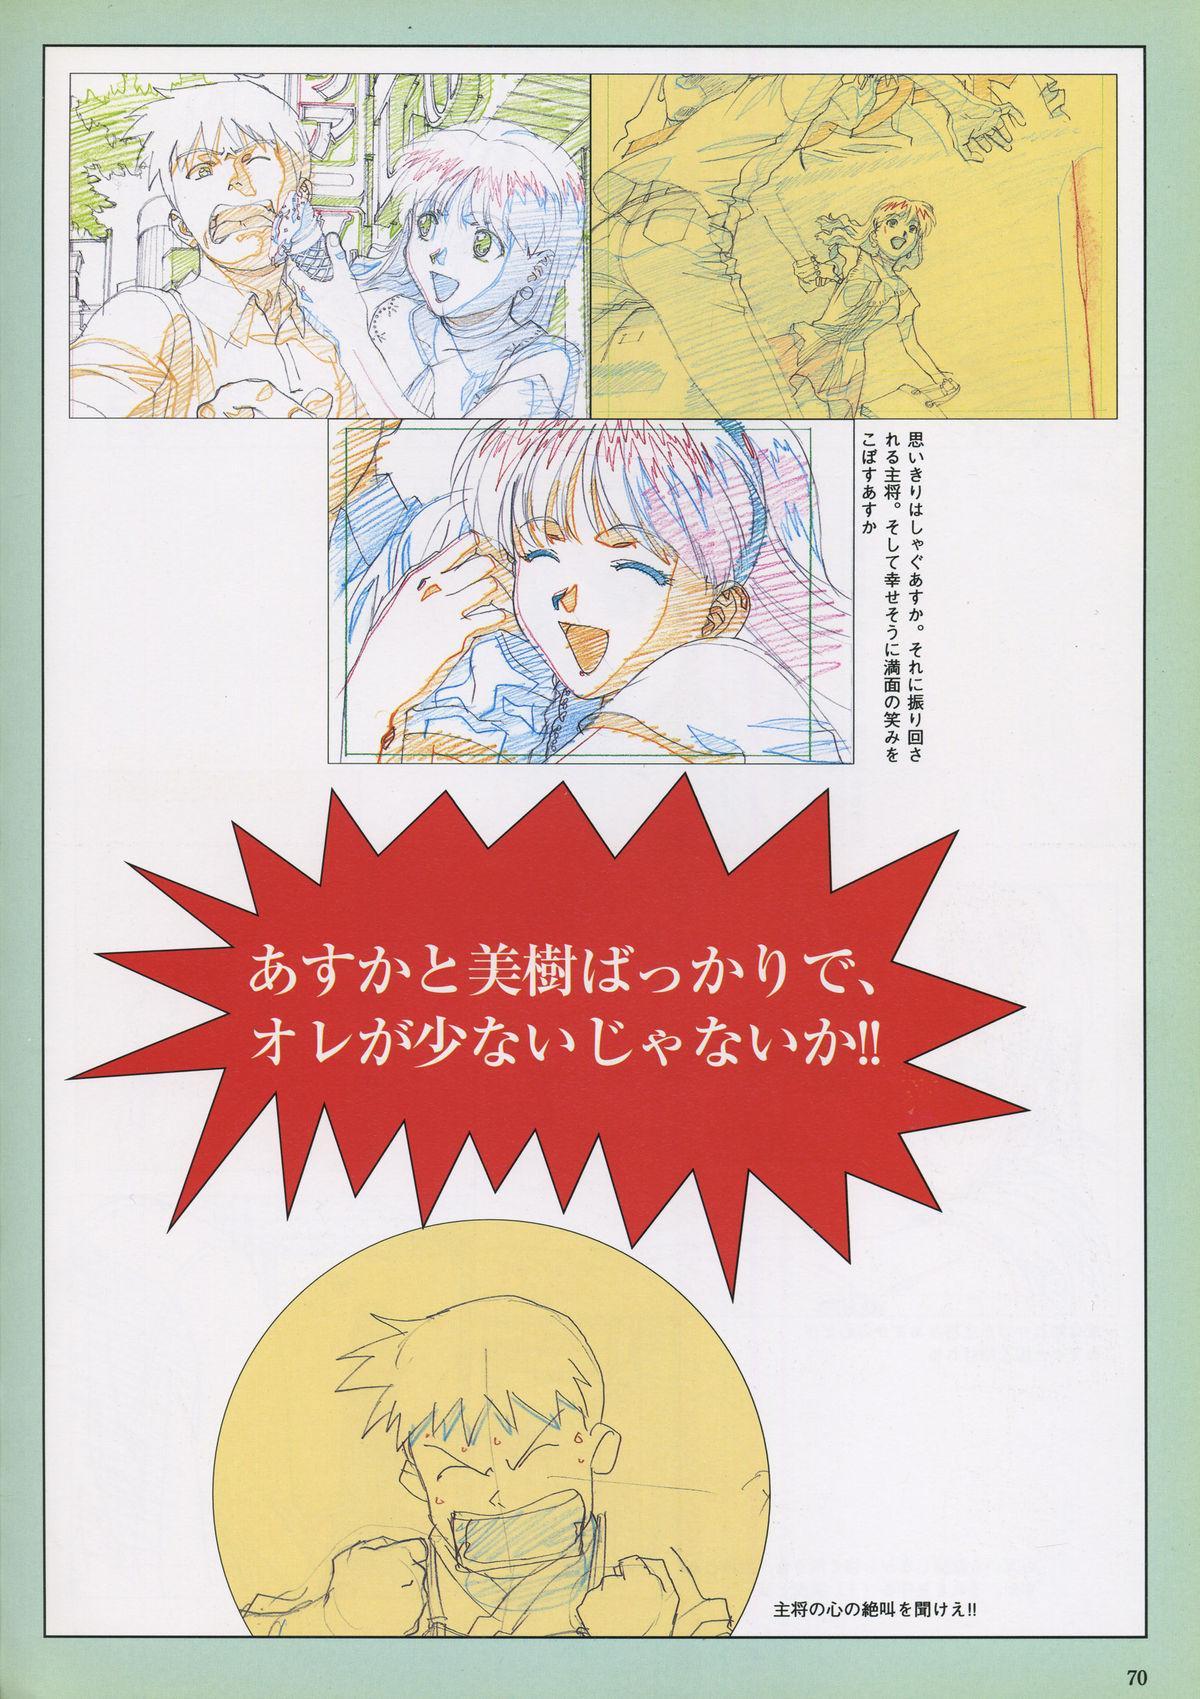 VIPER Series Official Artbook III 72